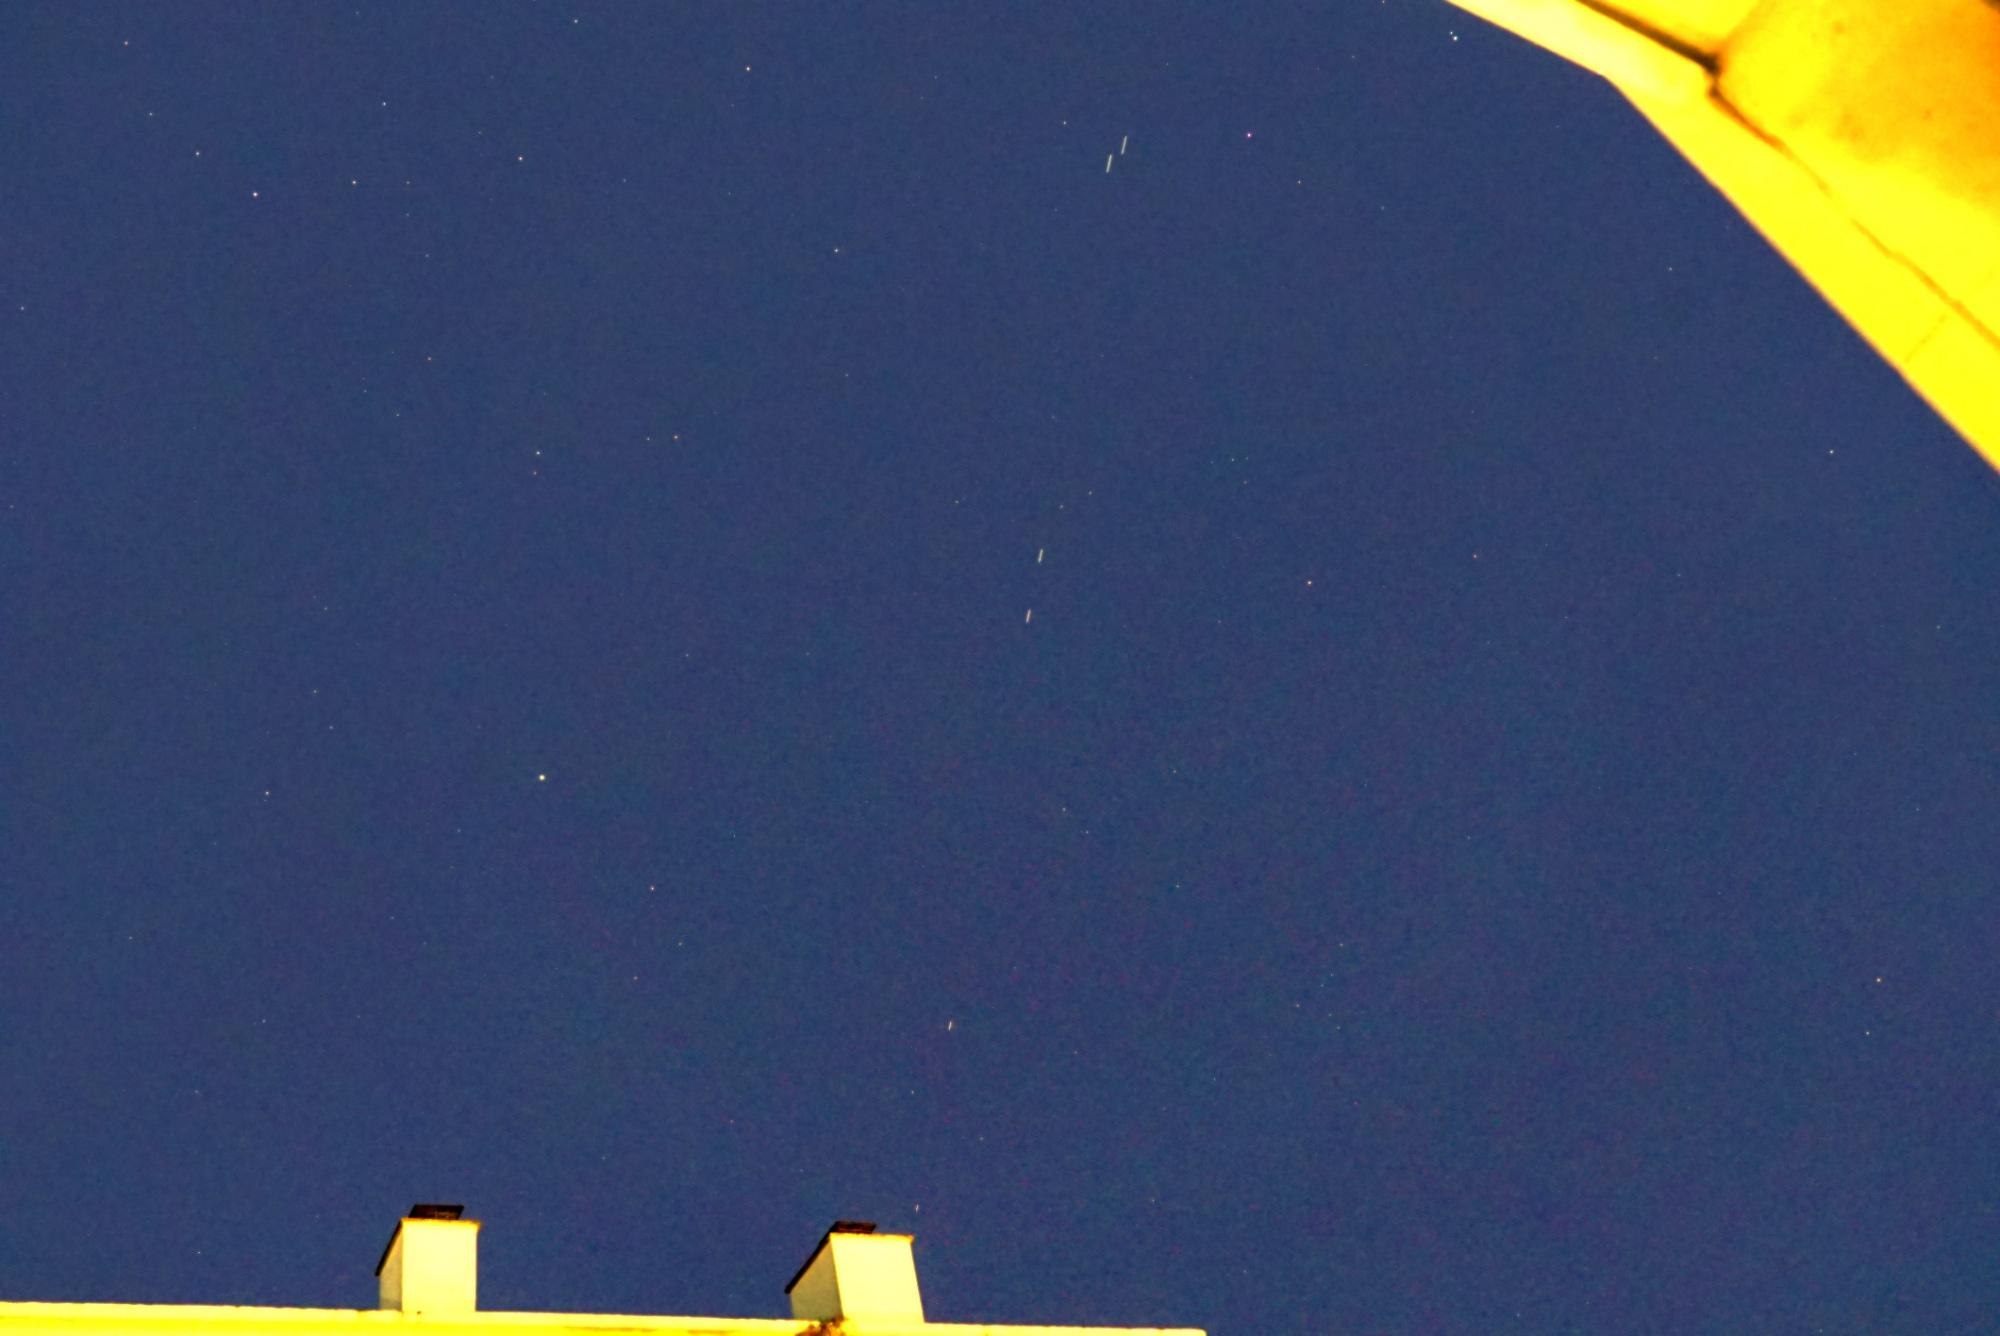 starlink5-versailles-300320-4h41m12-30mmf4bsbf-0p5s.jpg